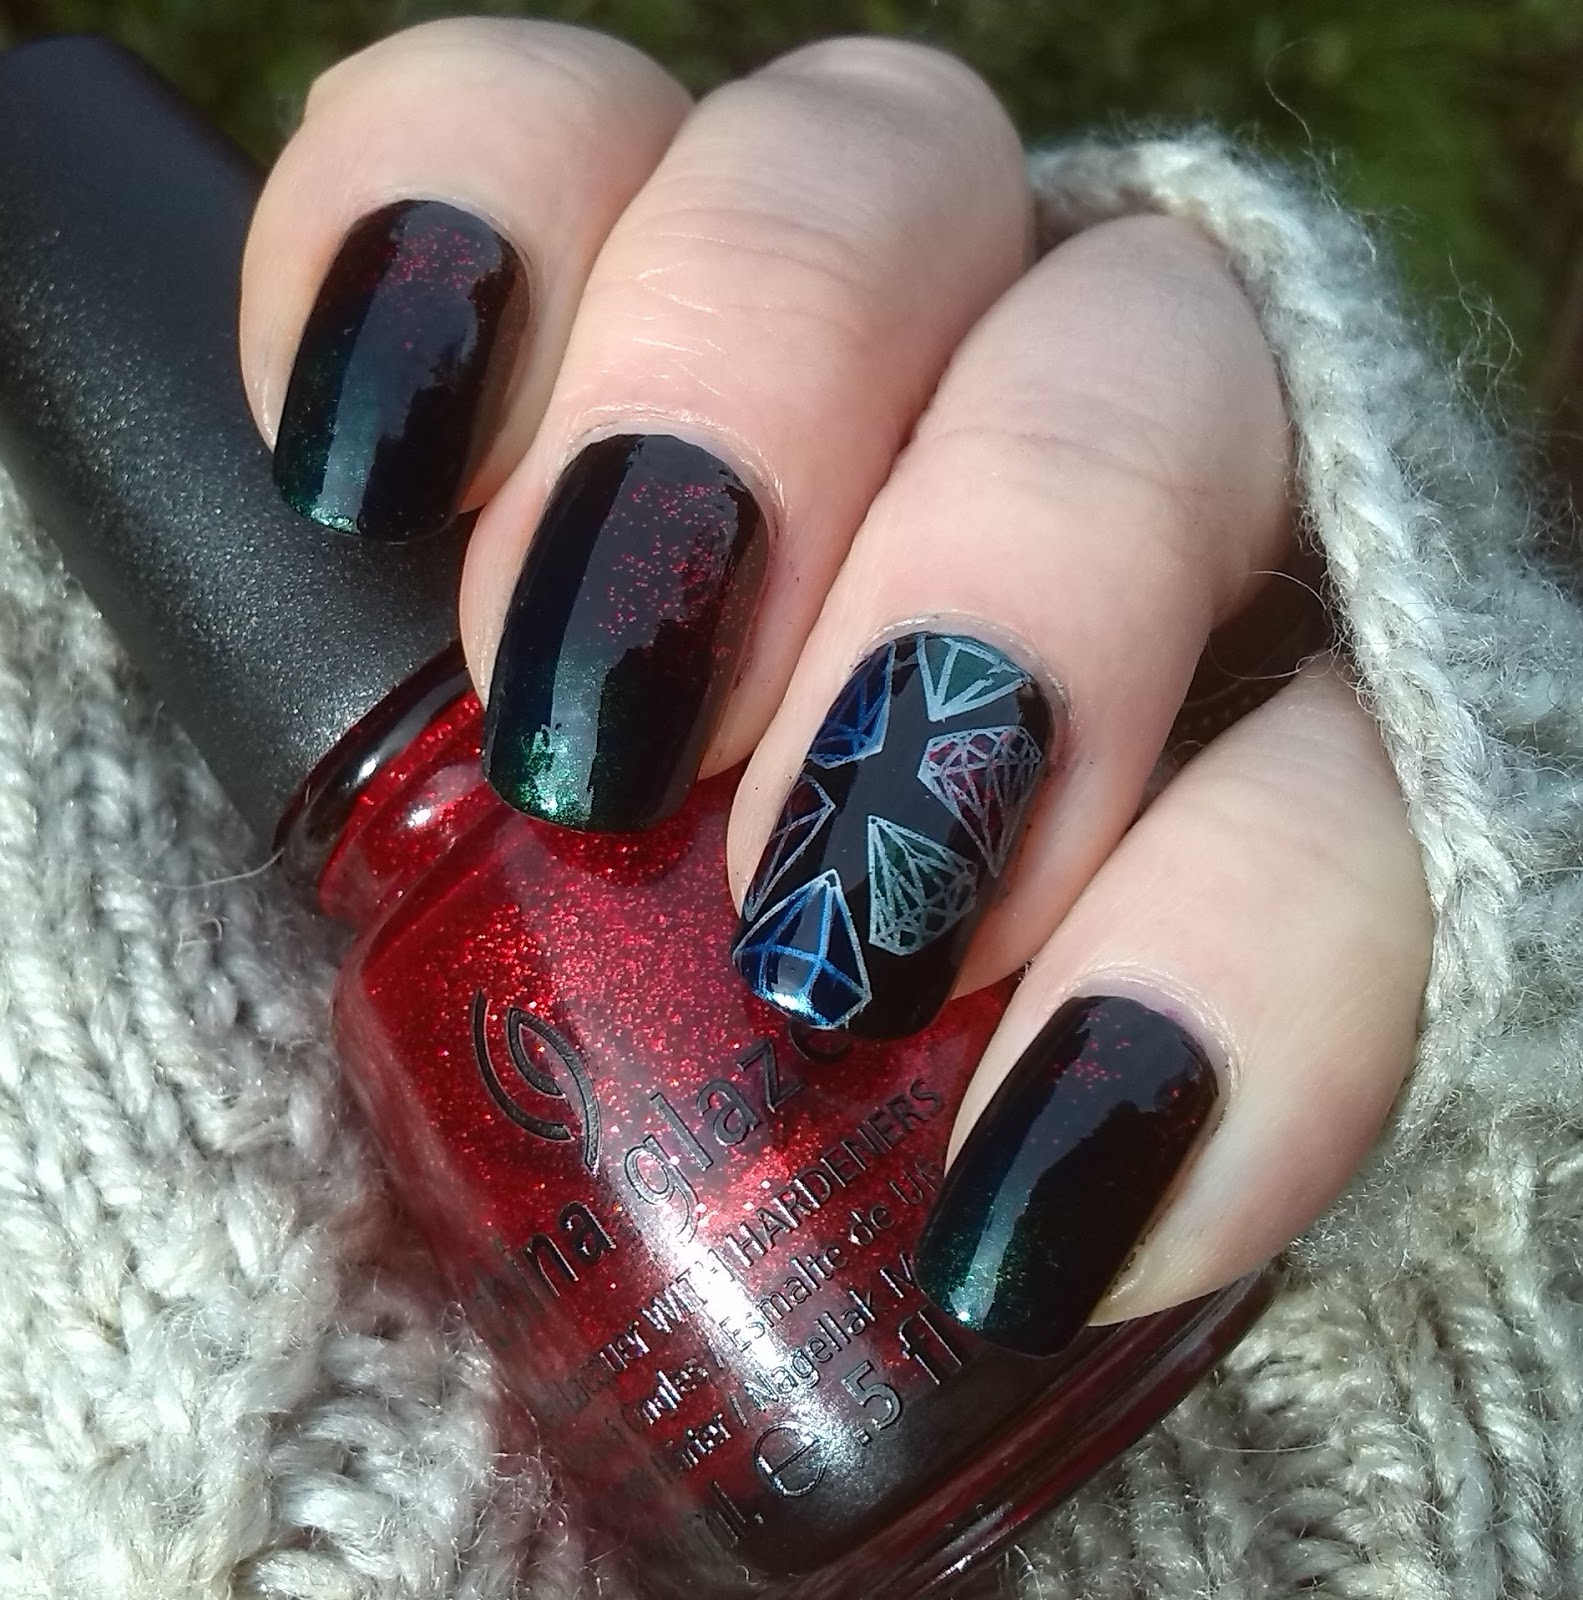 Gems - UberChic Beauty UC2-02